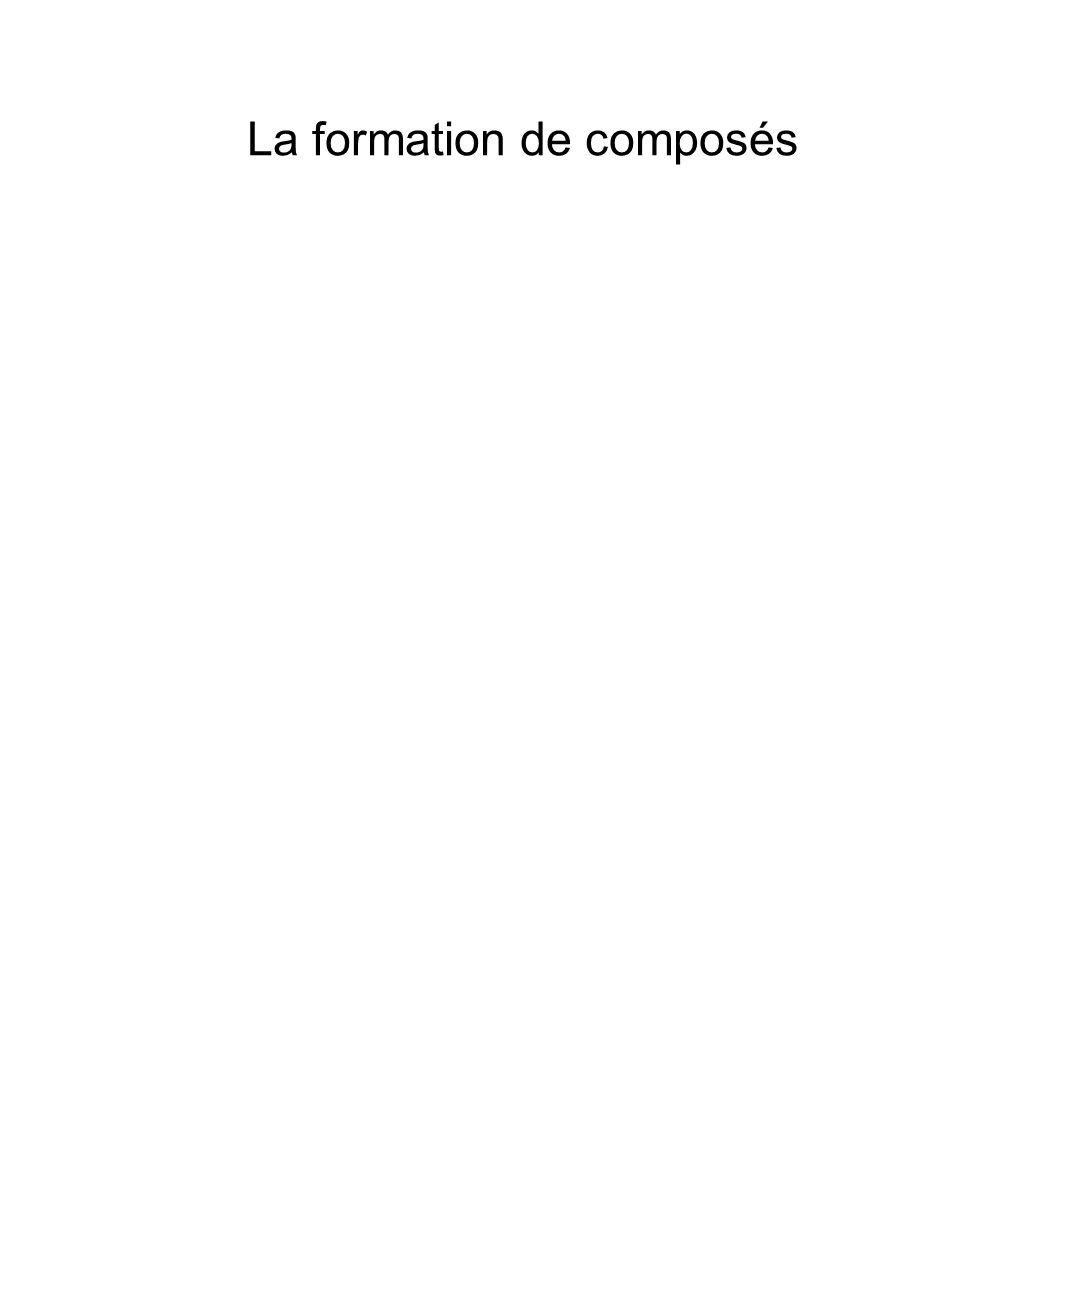 La formation de composés